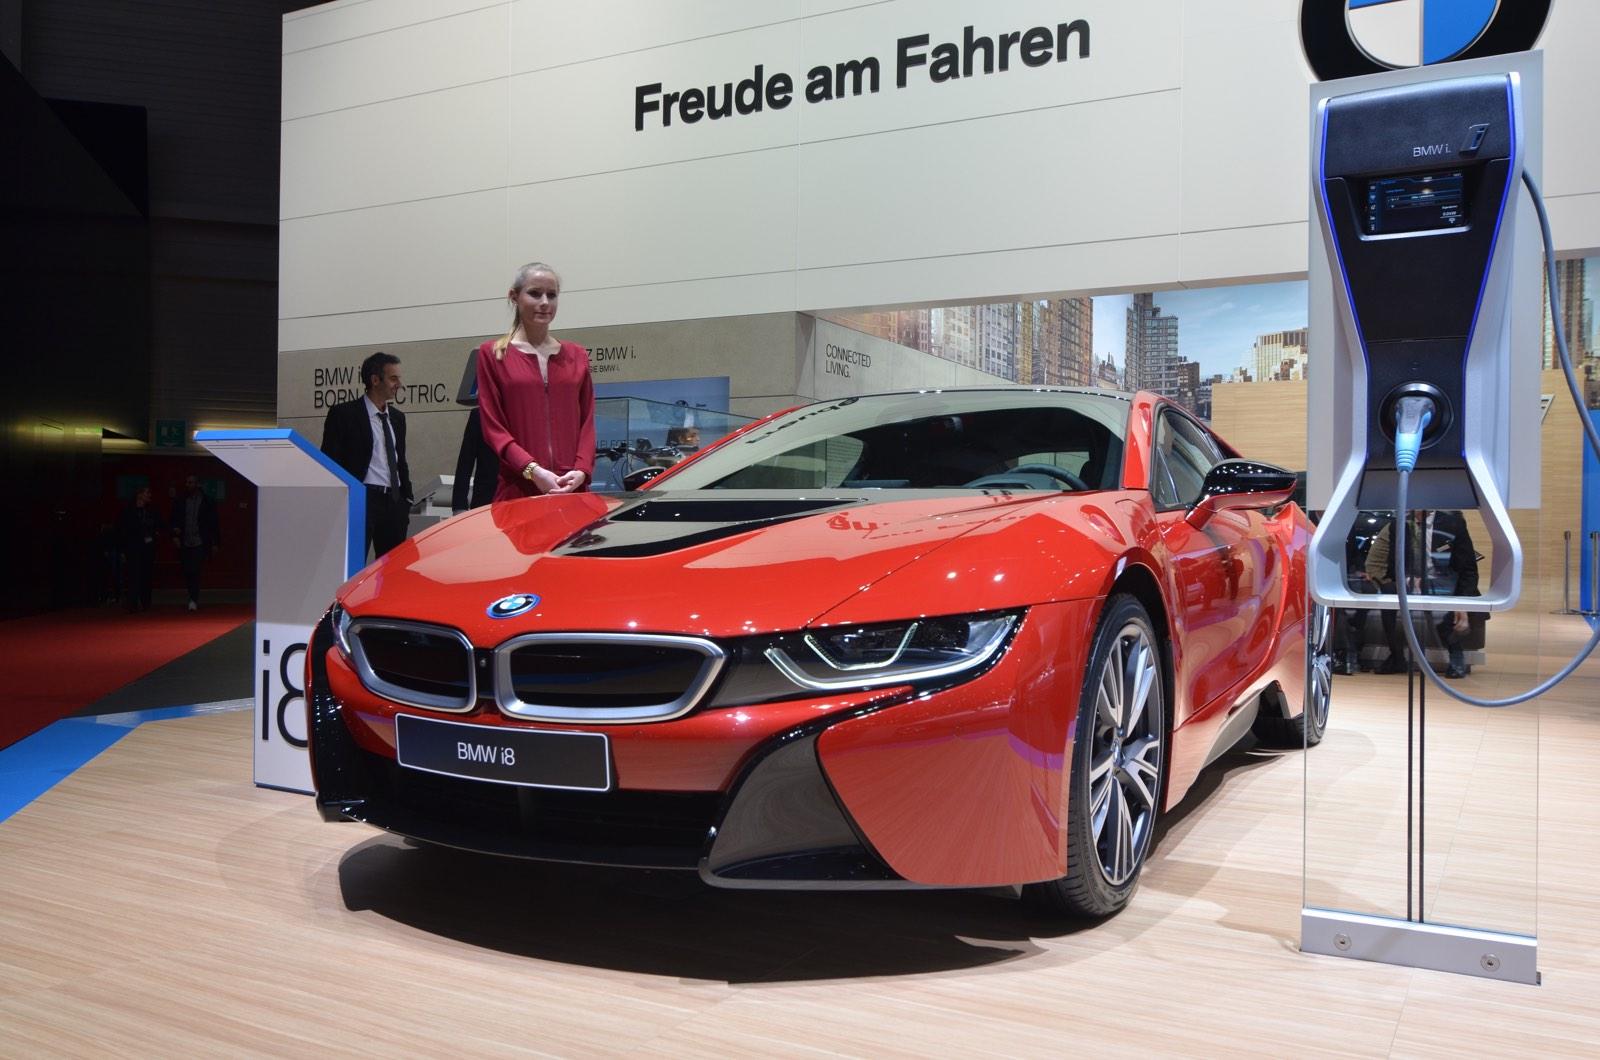 Geneva 2018 Bmw I8 Protonic Red Edition Gtspirit